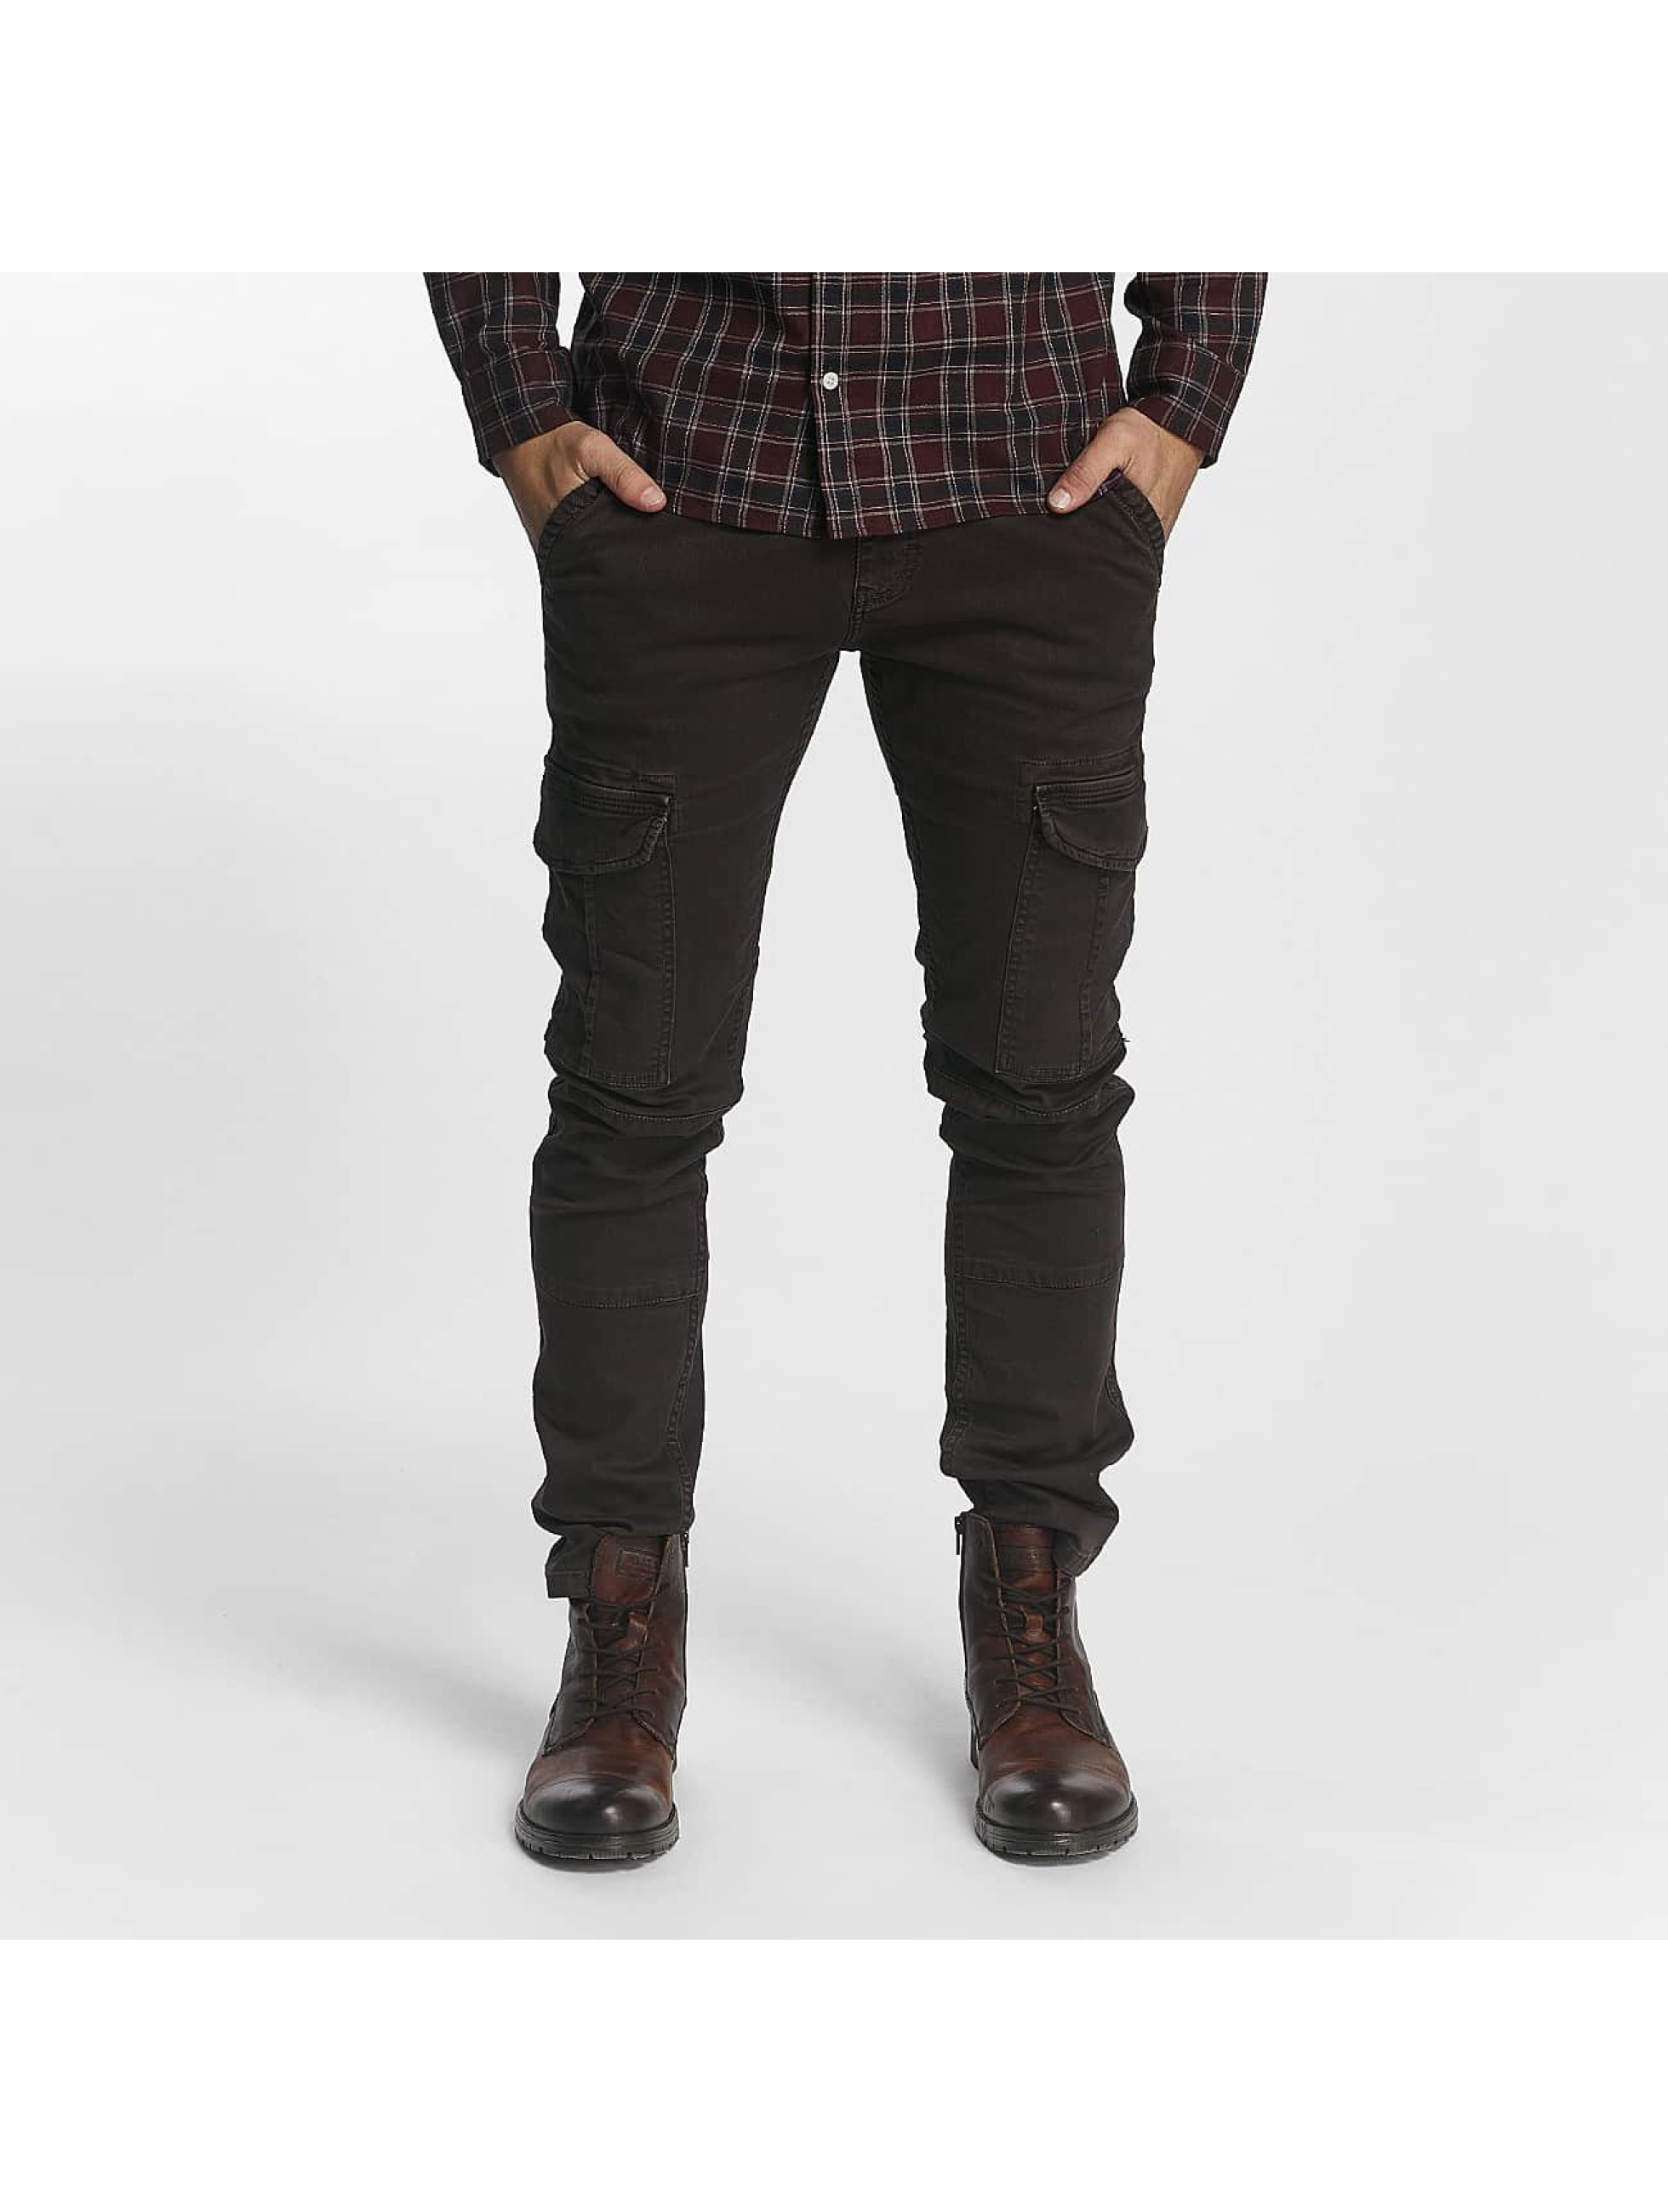 Mavi Jeans Männer Cargohose Yves Cargo in braun